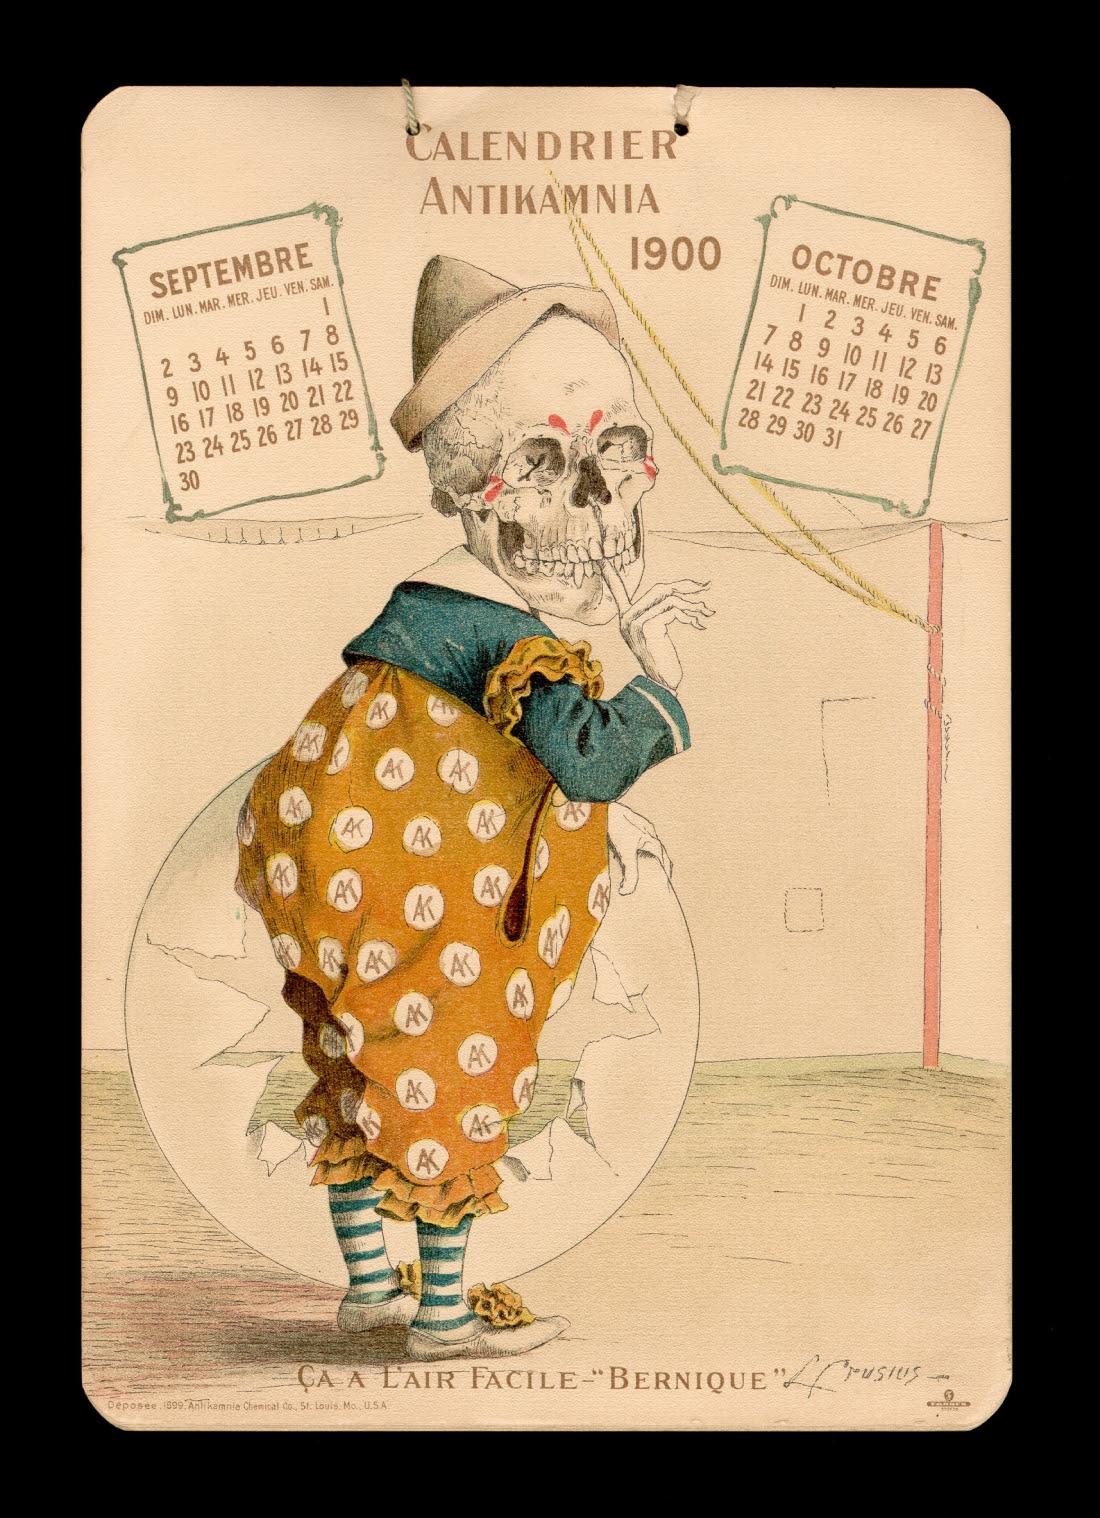 calendar Antikamnia 1900